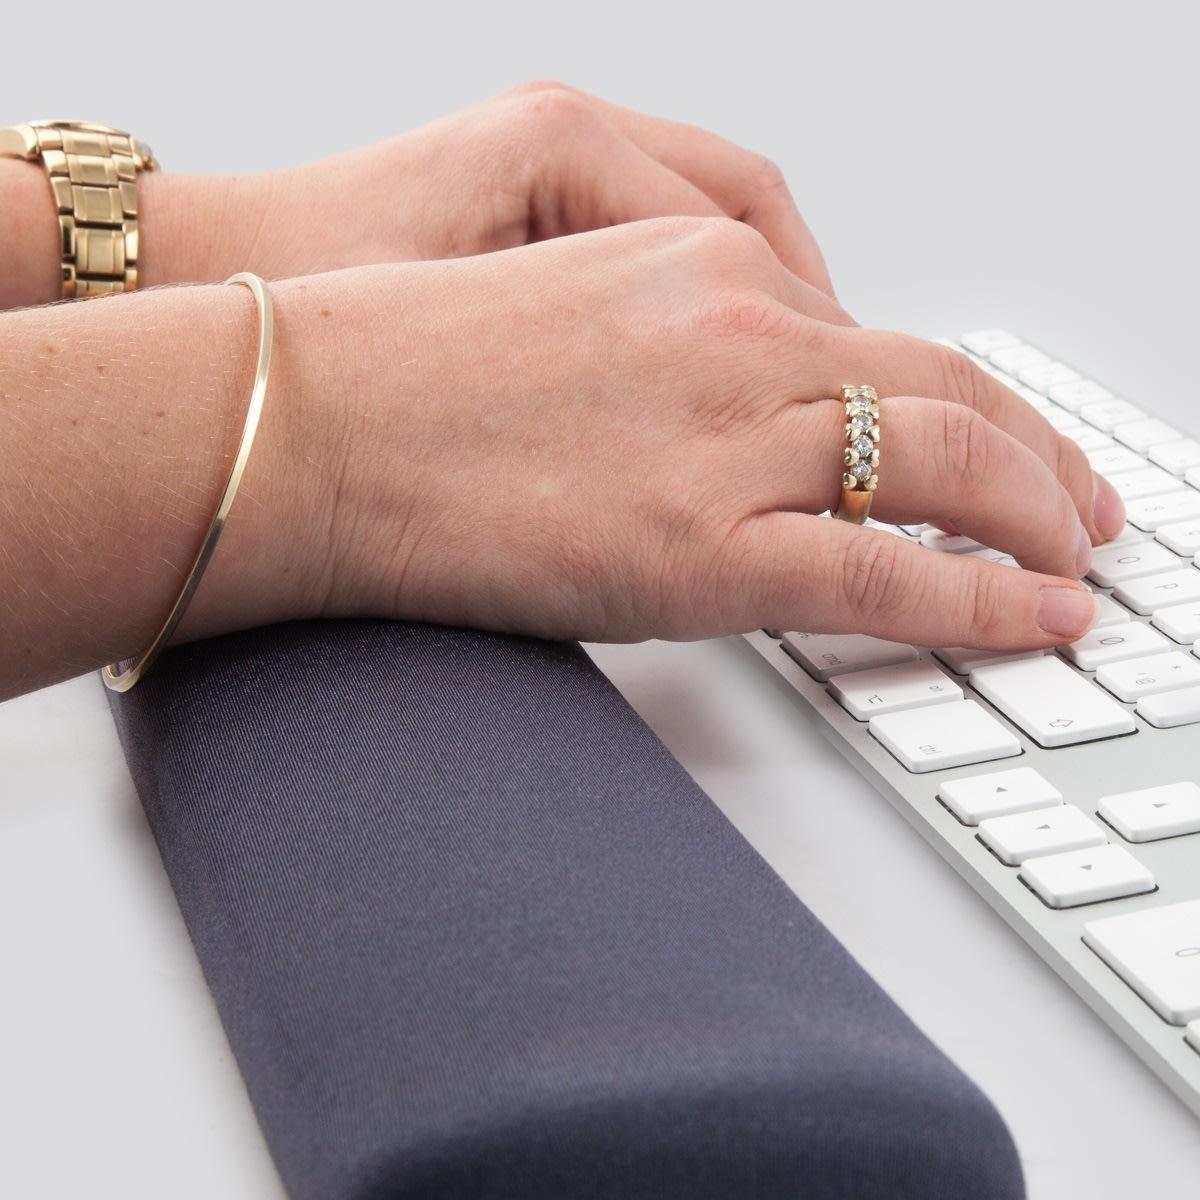 Tastatur håndledsstøtte gel